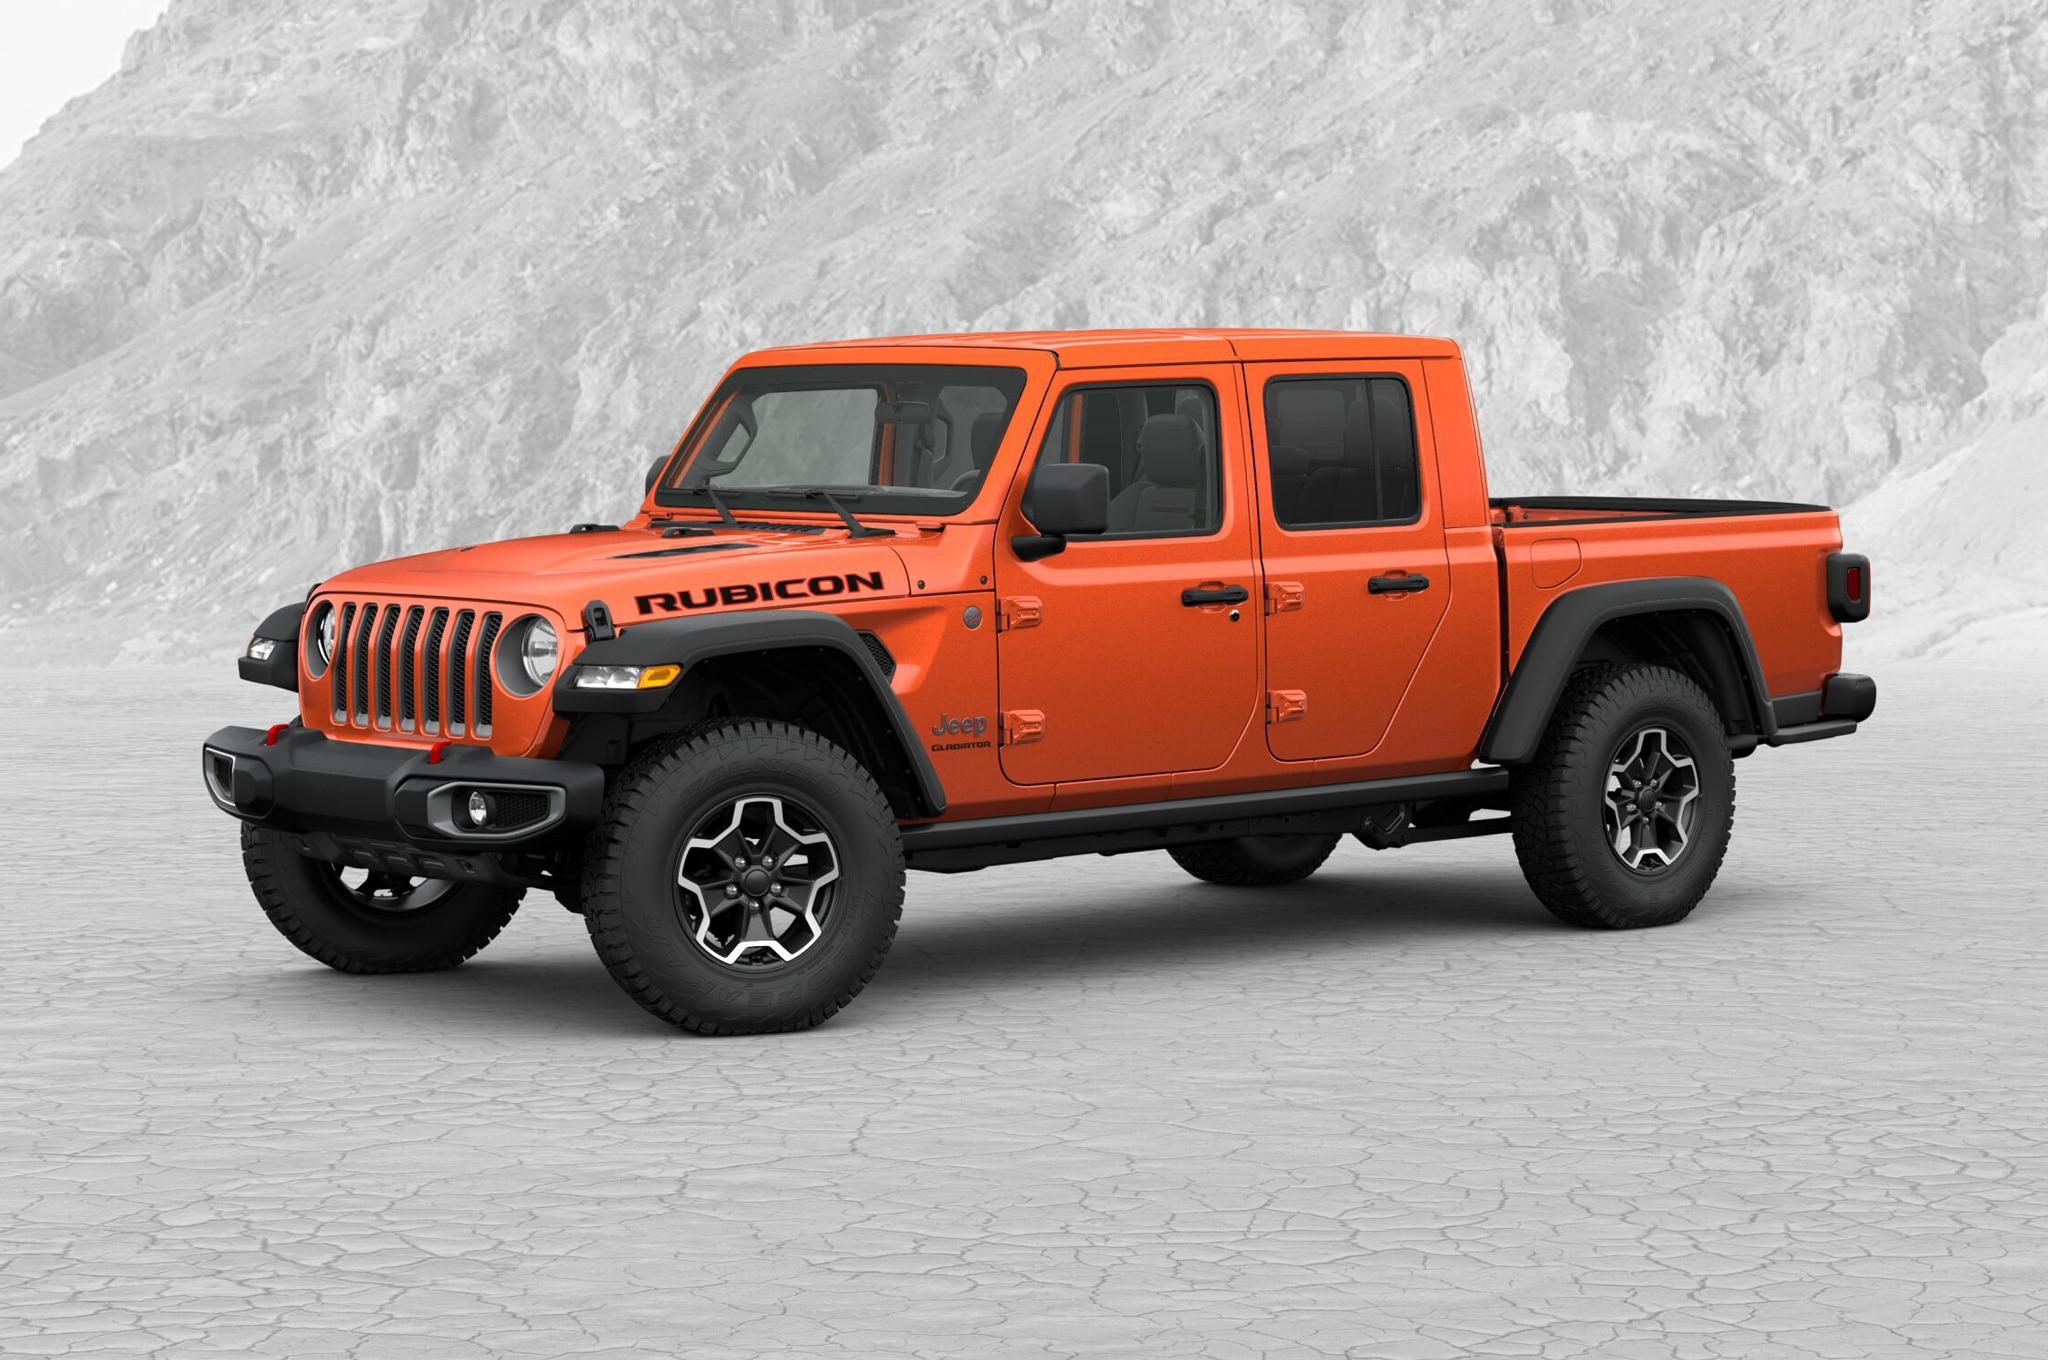 2020 jeep gladiator configurator goes live, no prices